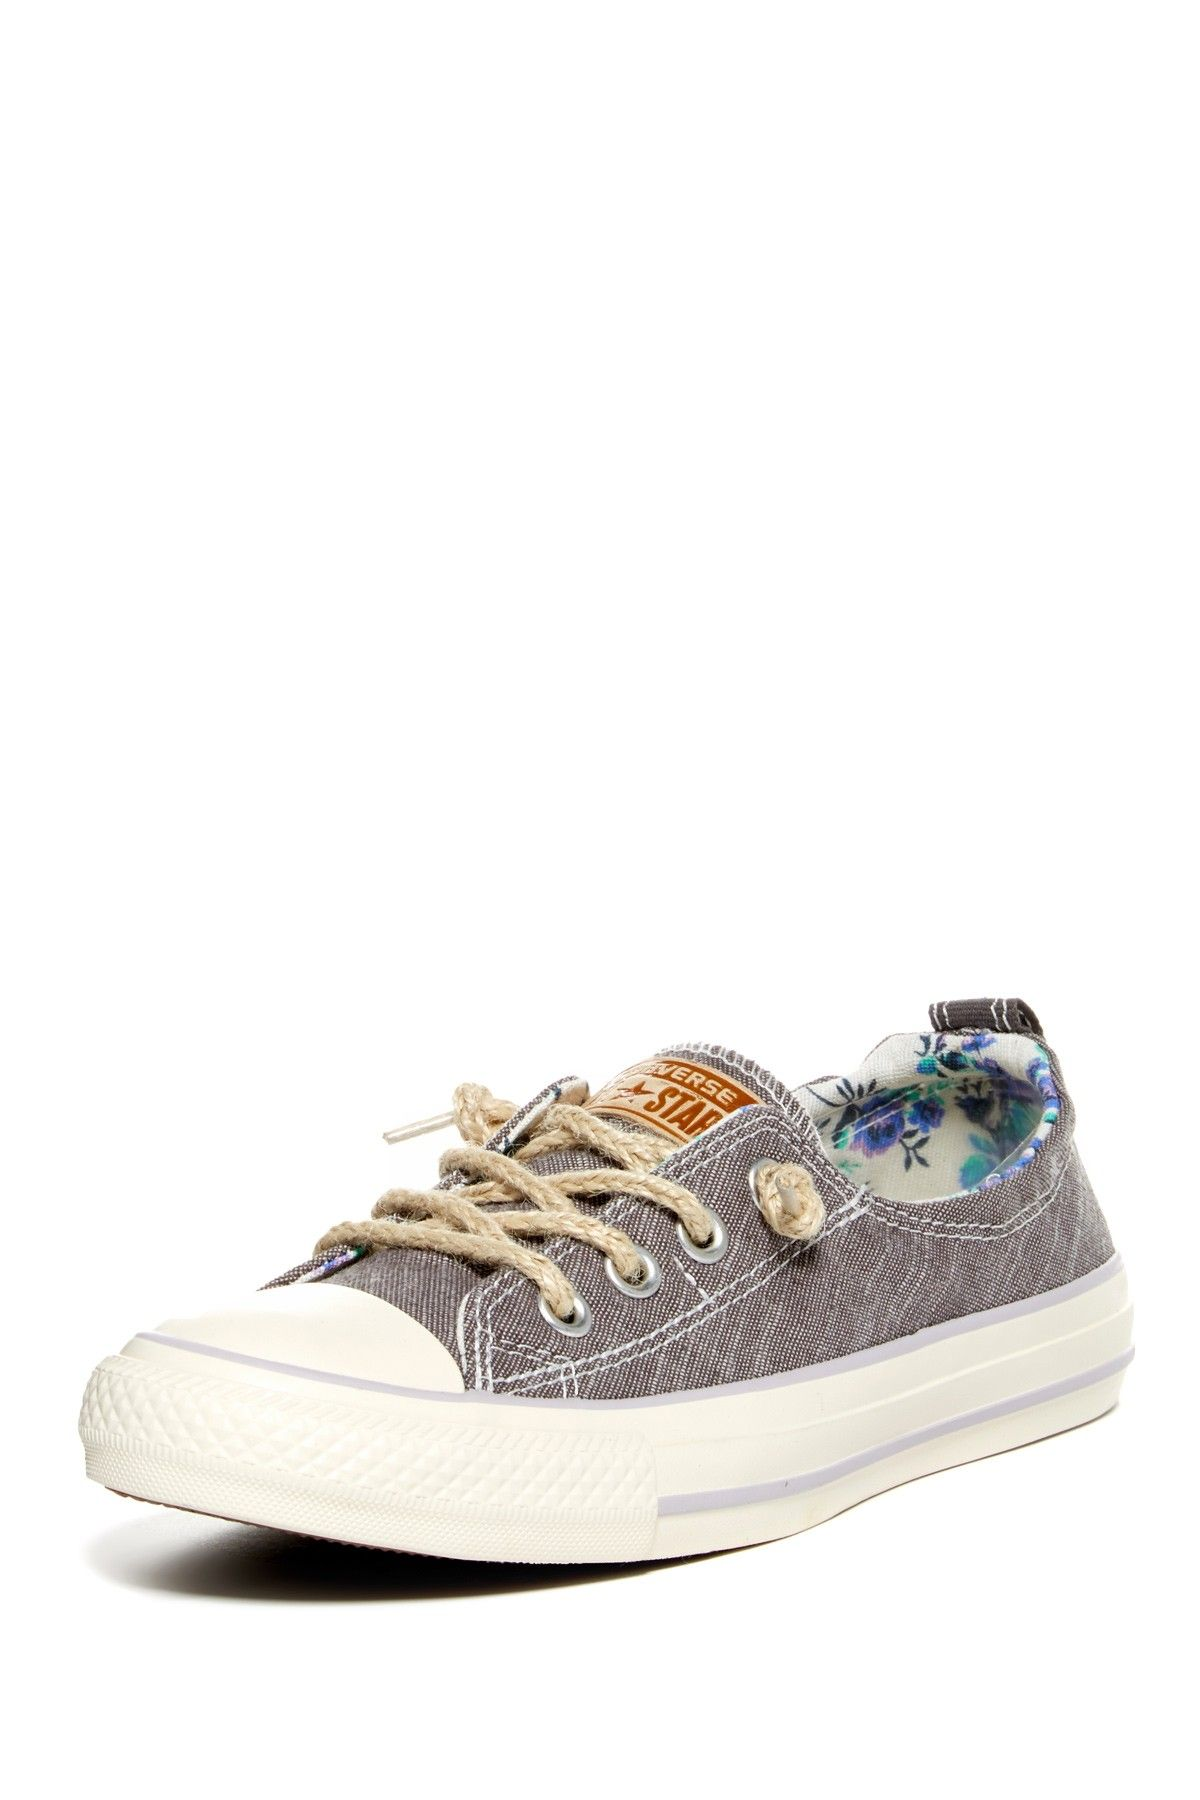 756a65c7994e Chuck Taylor All Star Shoreline Oxford Sneaker